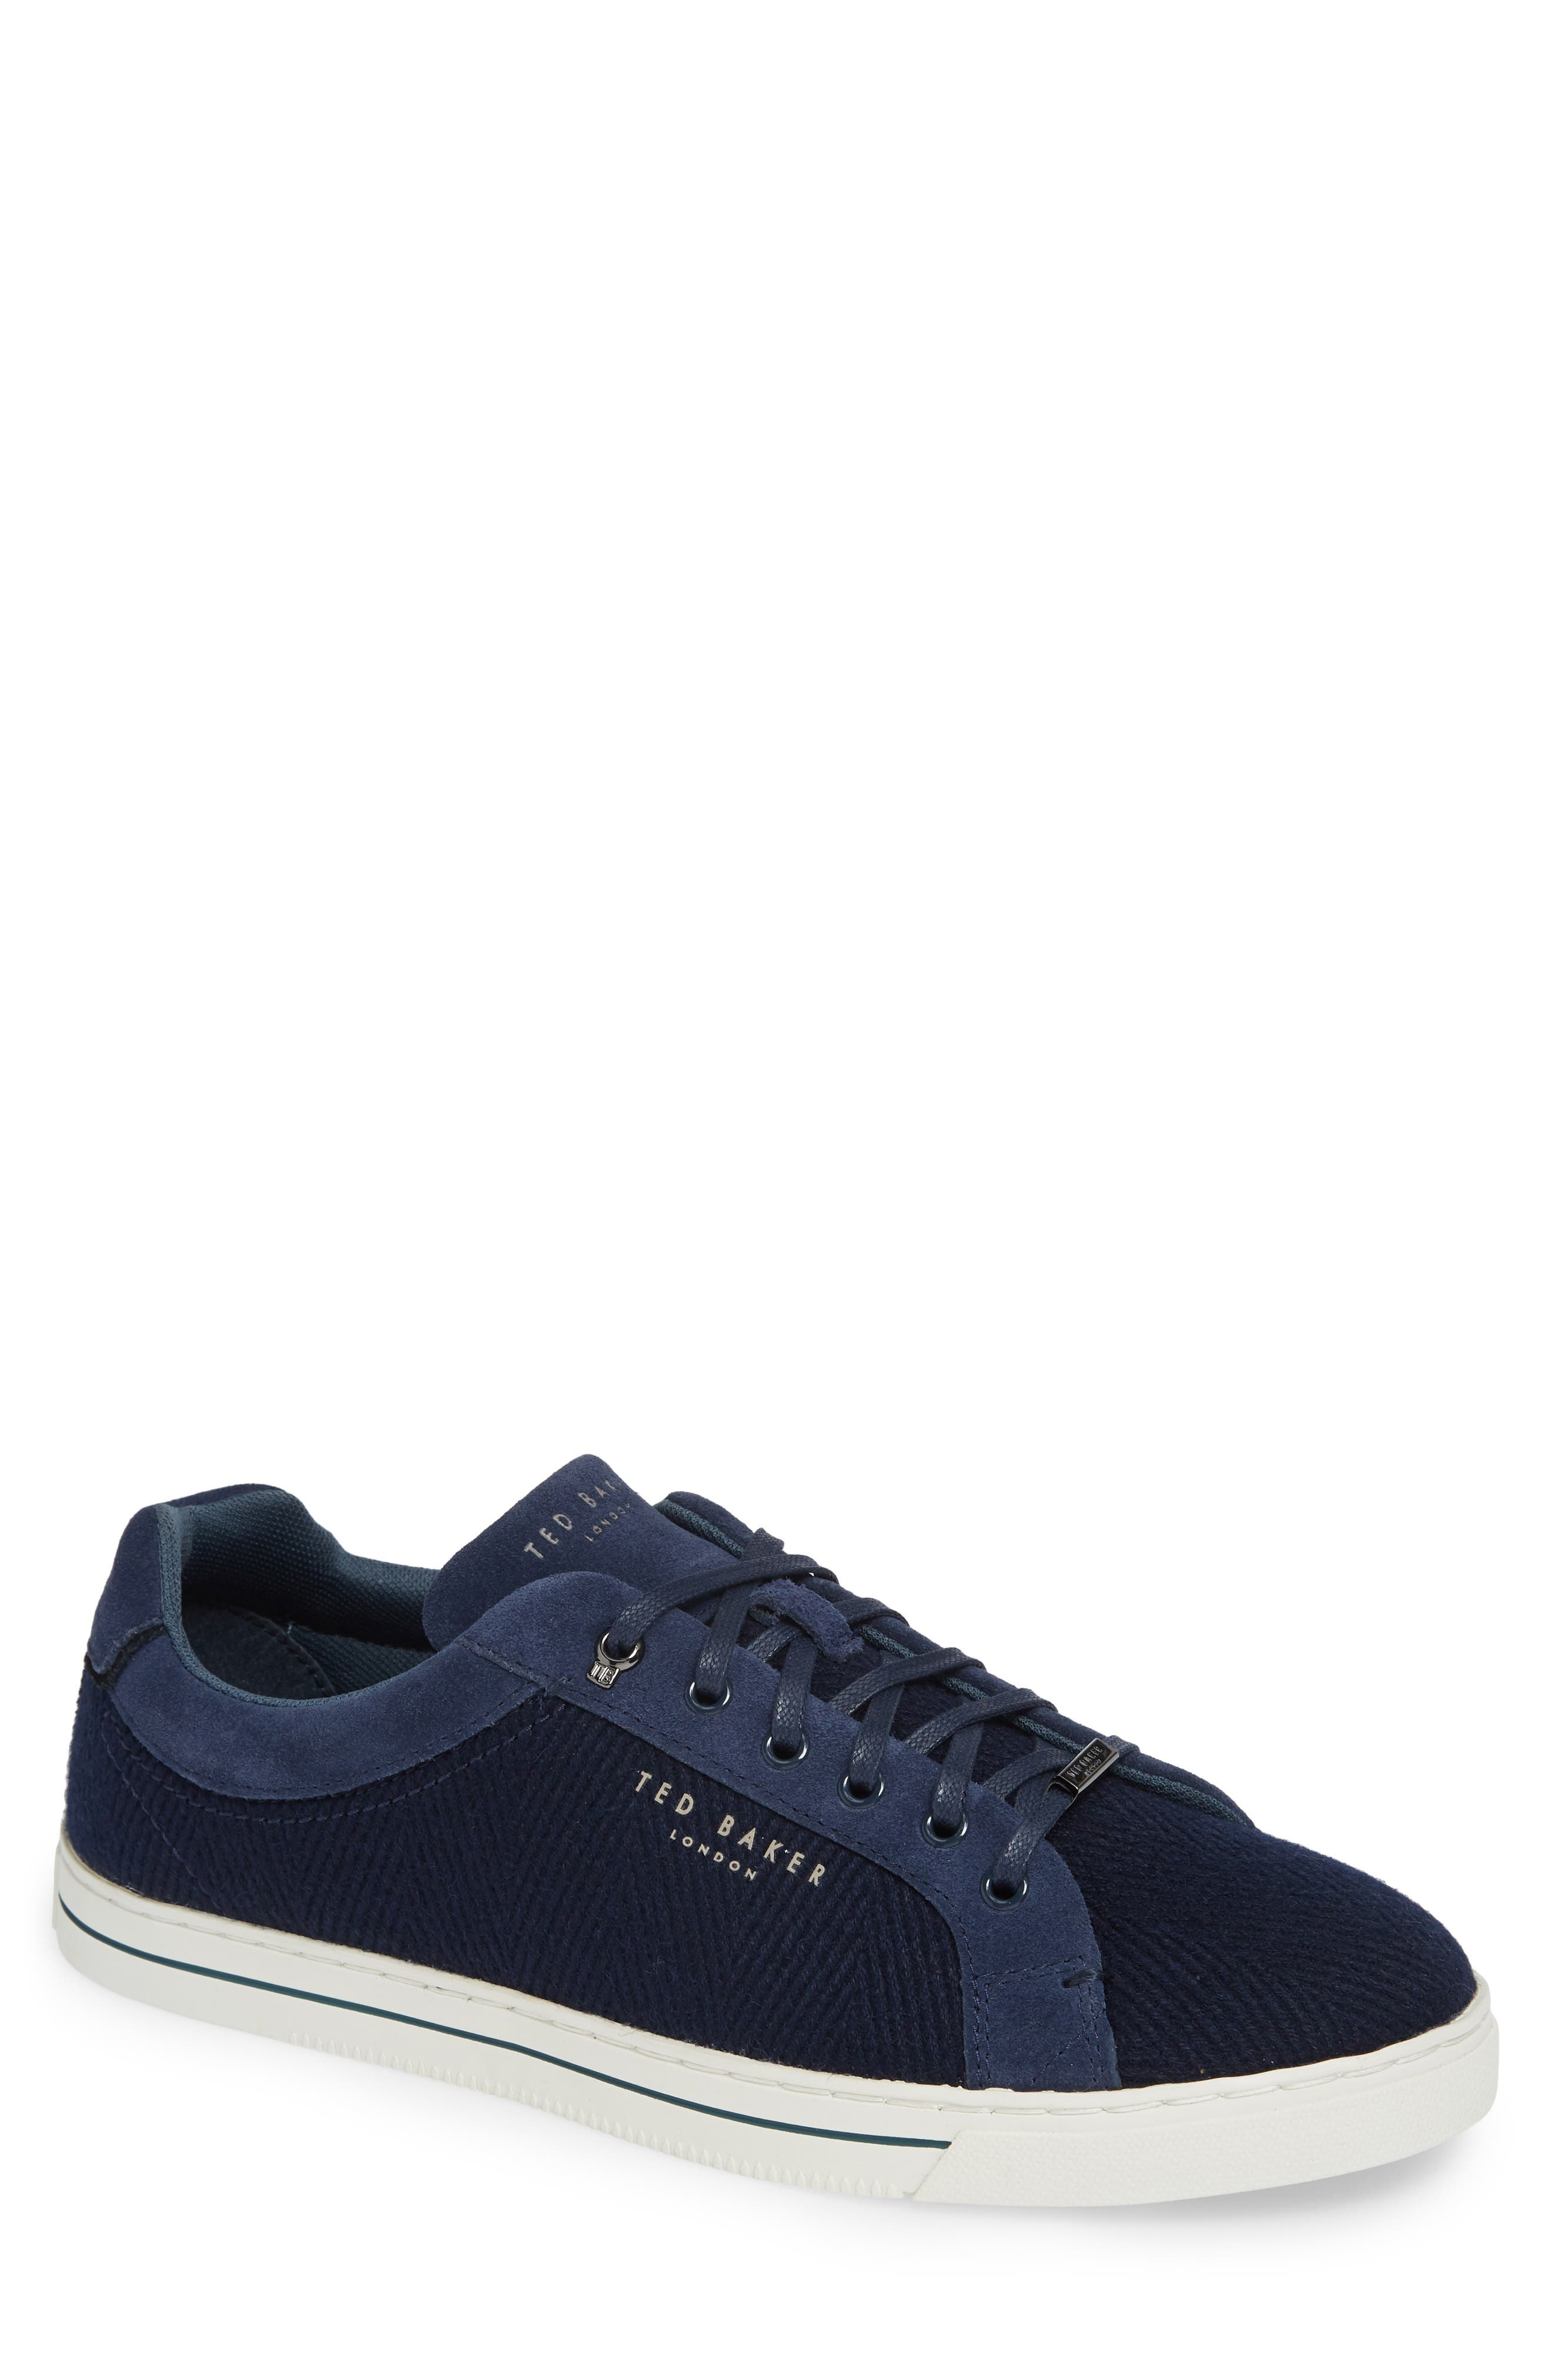 TED BAKER LONDON Werill Sneaker, Main, color, DARK BLUE WOOL